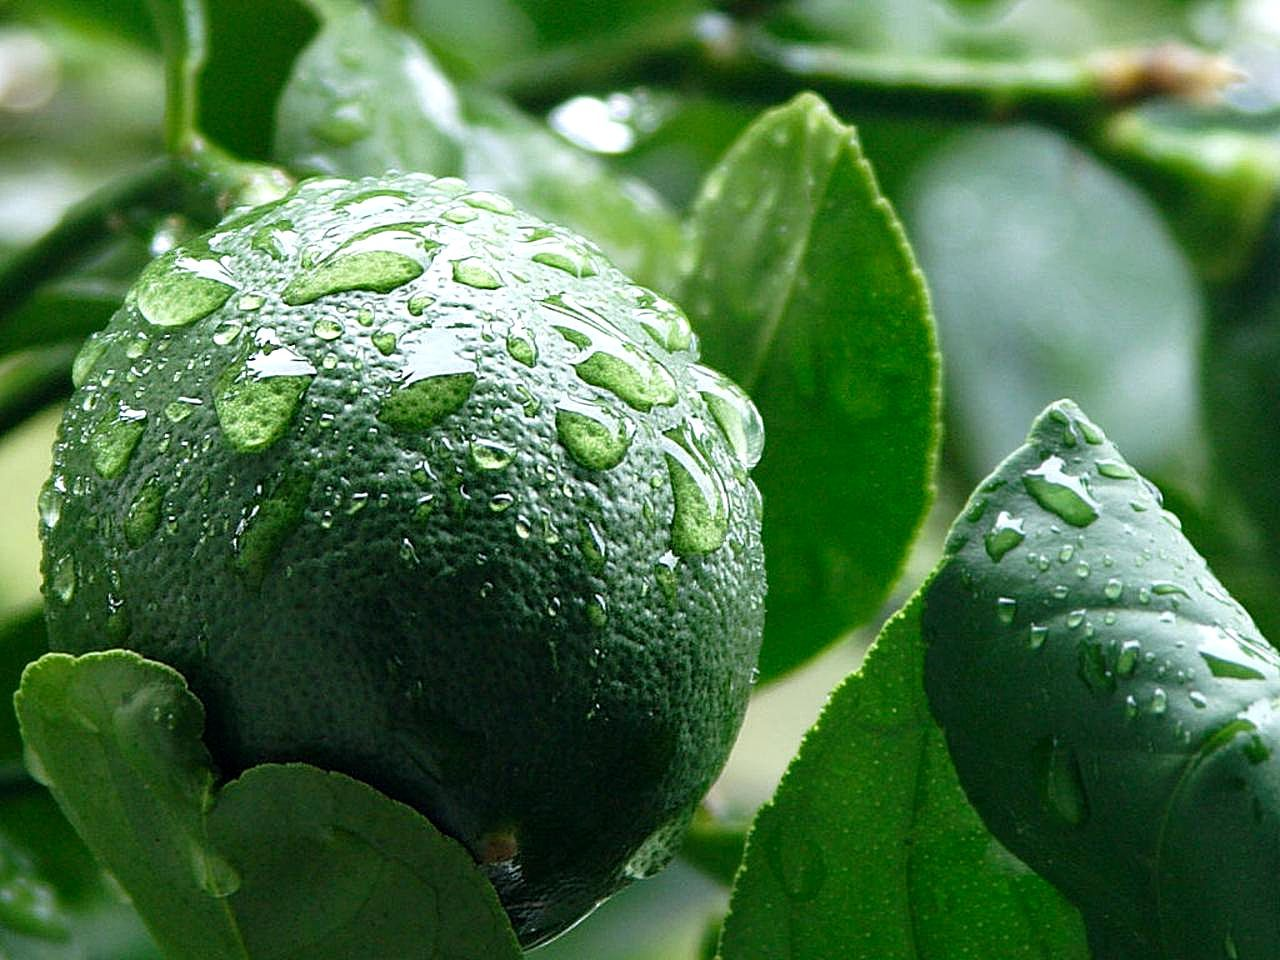 Green lemon pictures